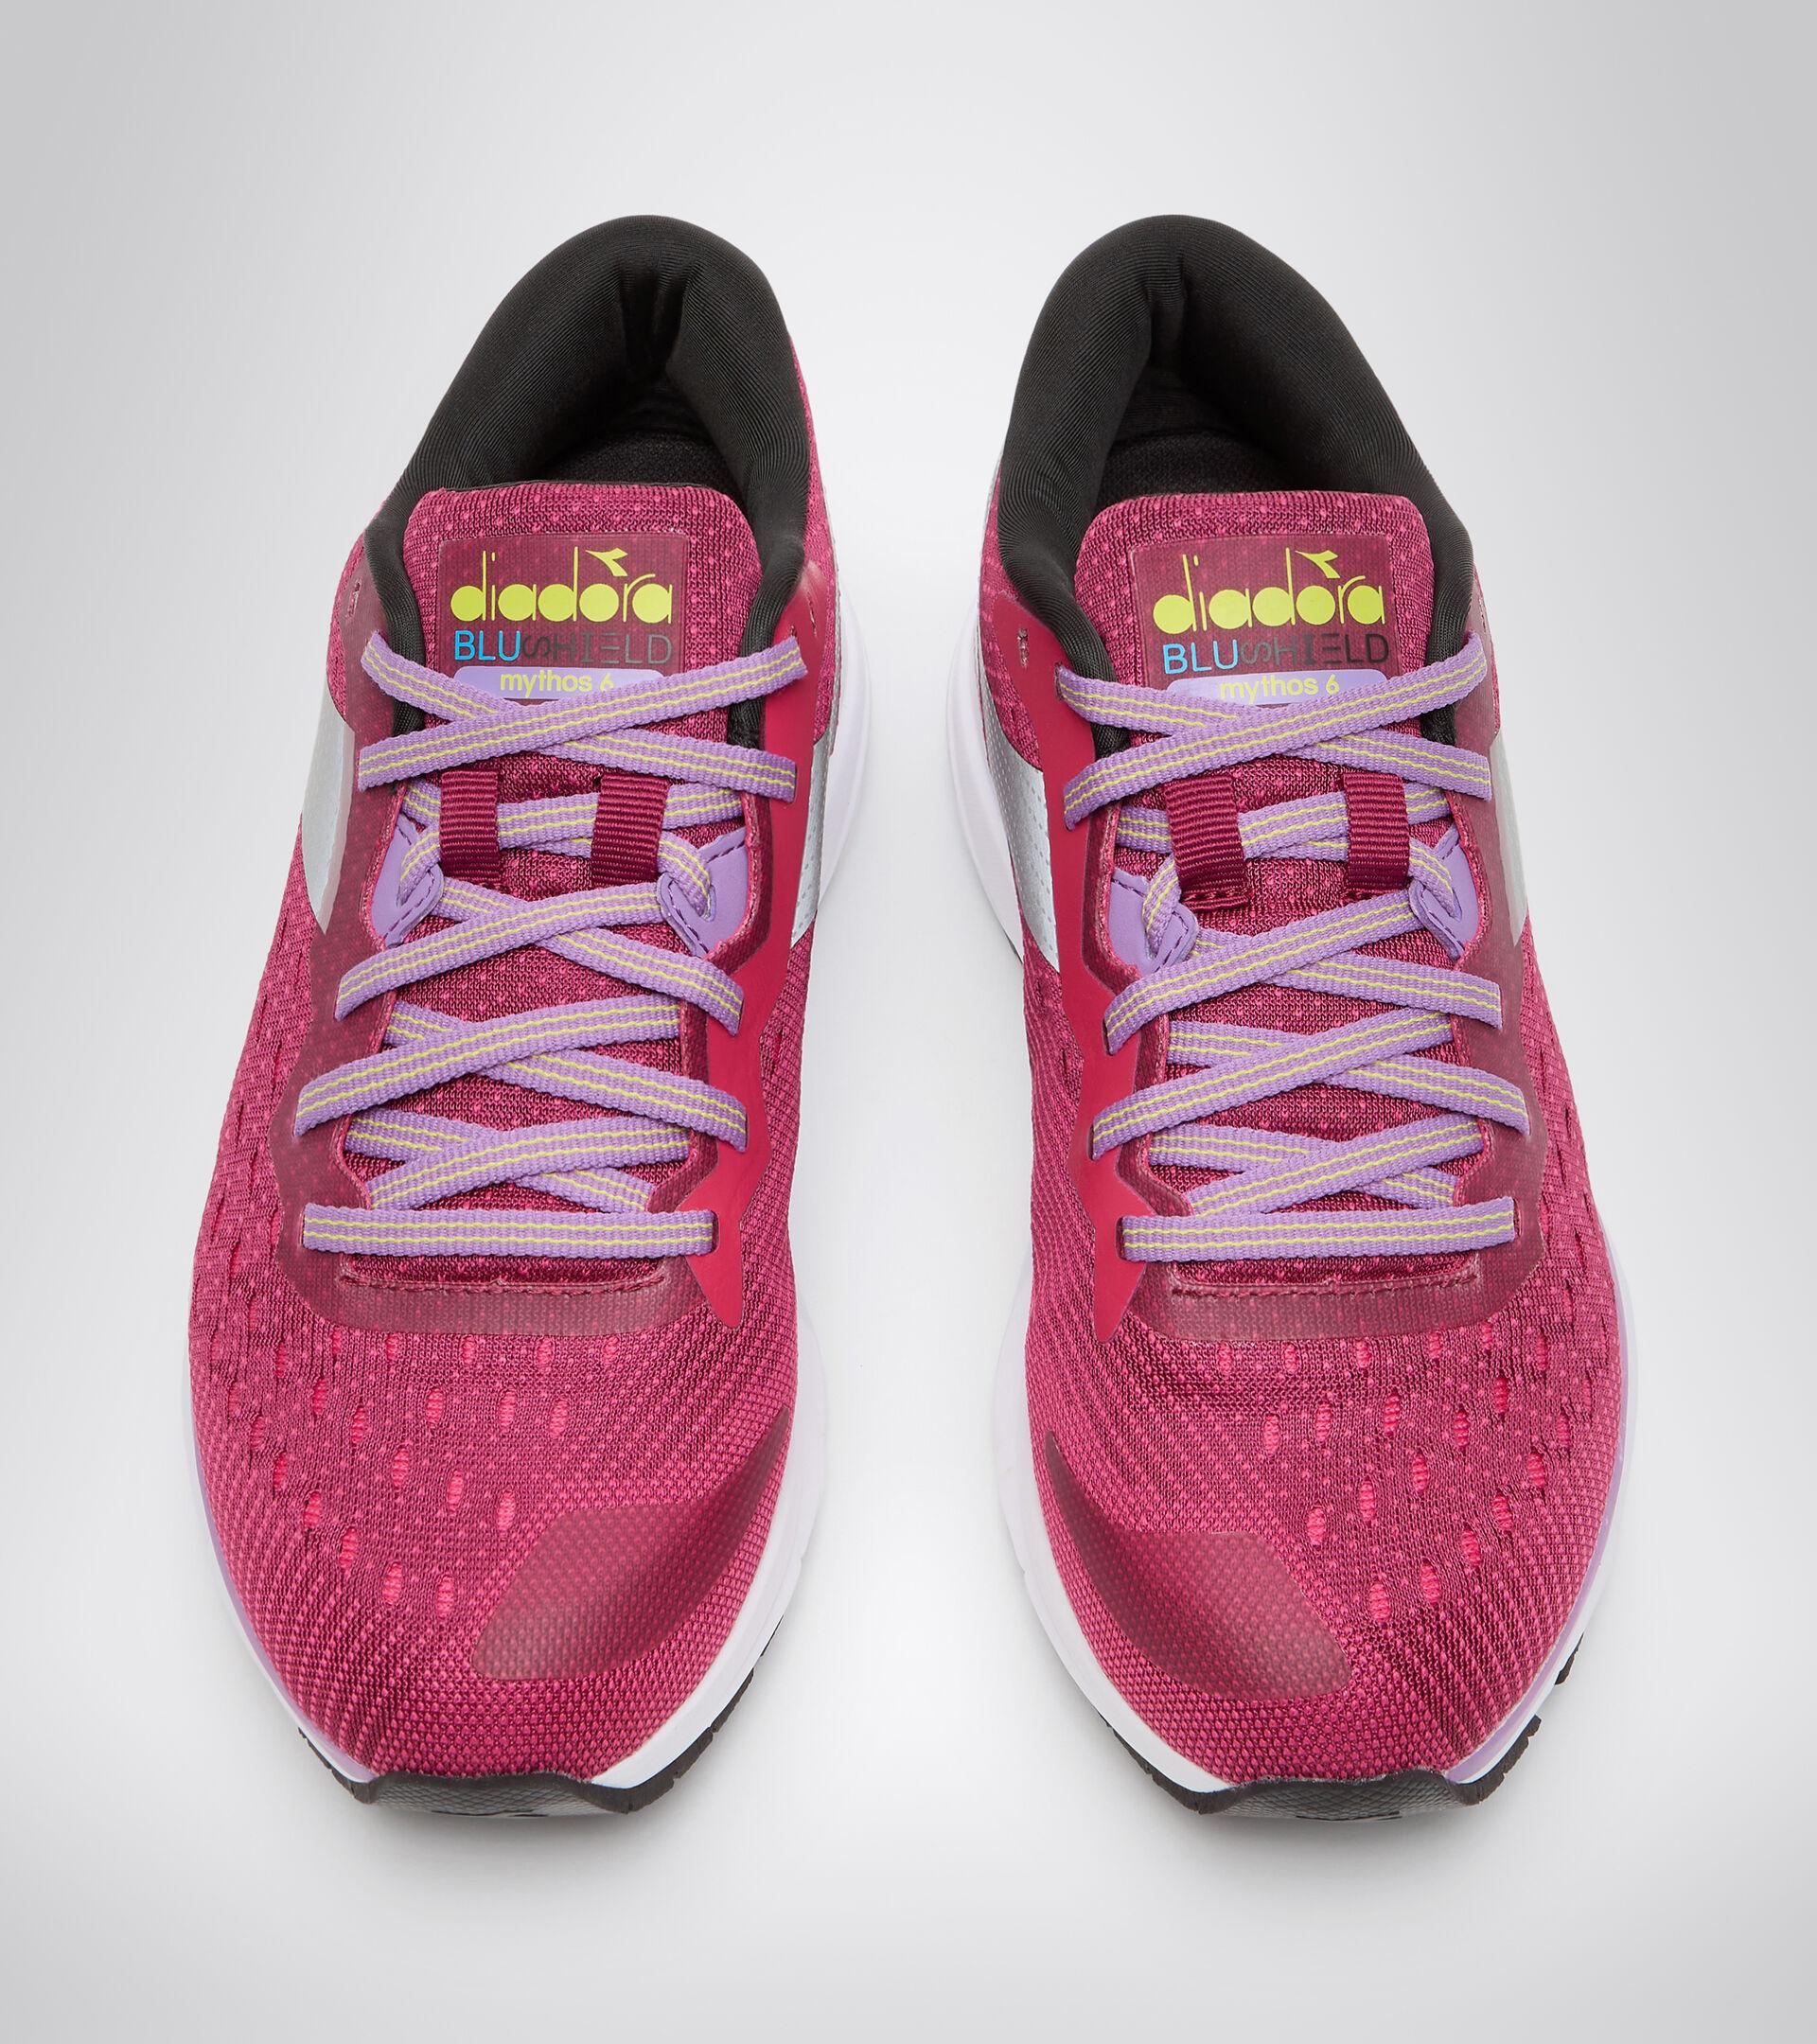 Zapatillas de running - Mujer MYTHOS BLUSHIELD 6 W RODODENDRO/ROSADO LLAMATIVO - Diadora